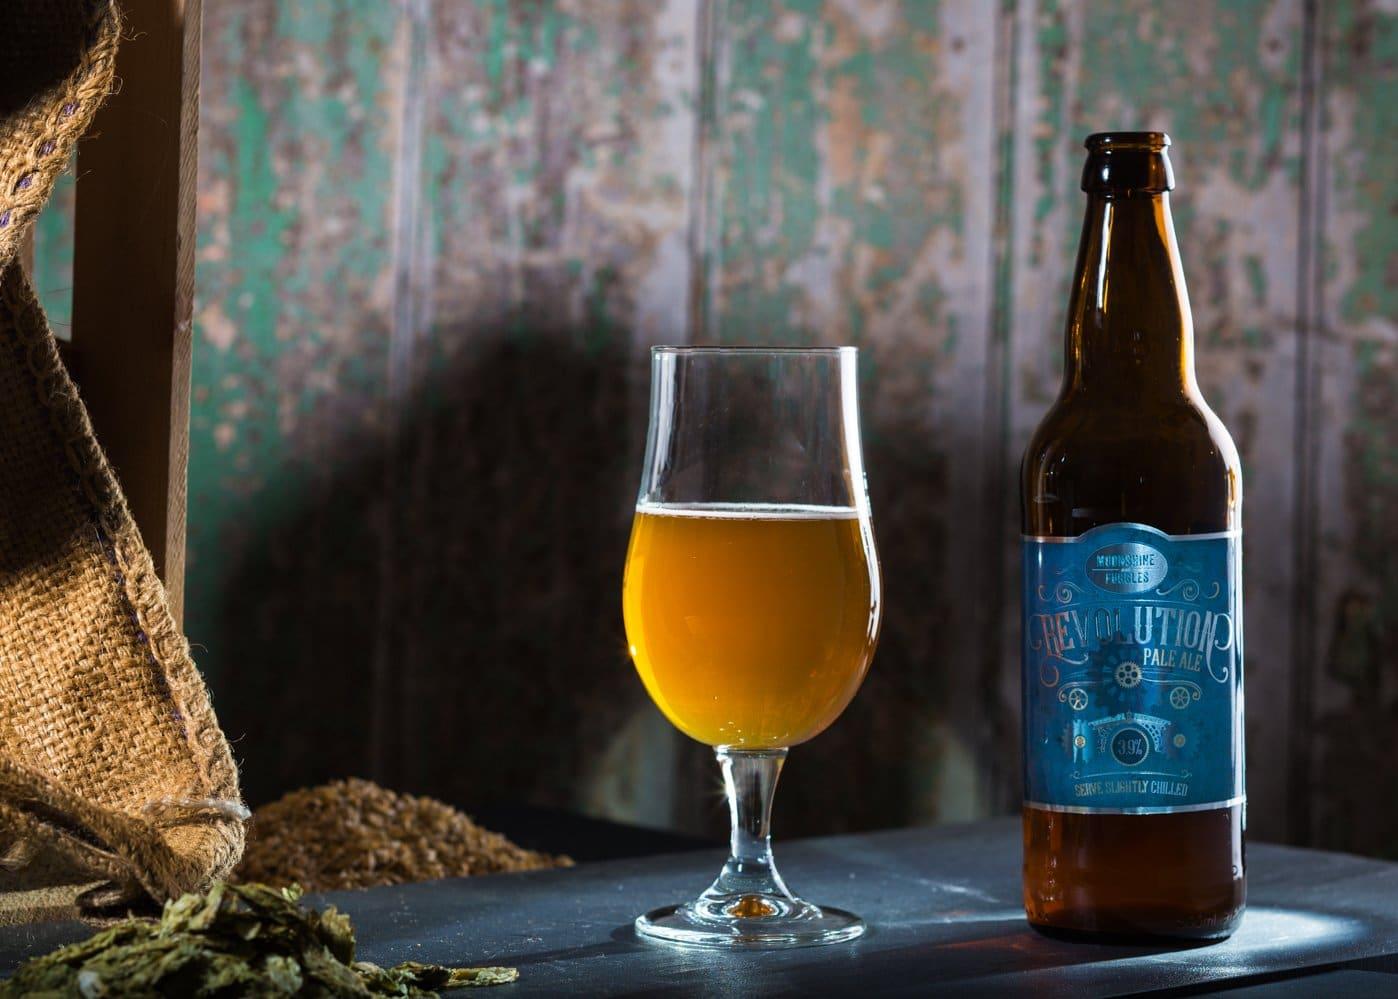 Moonshine & Fuggles Pale Ale